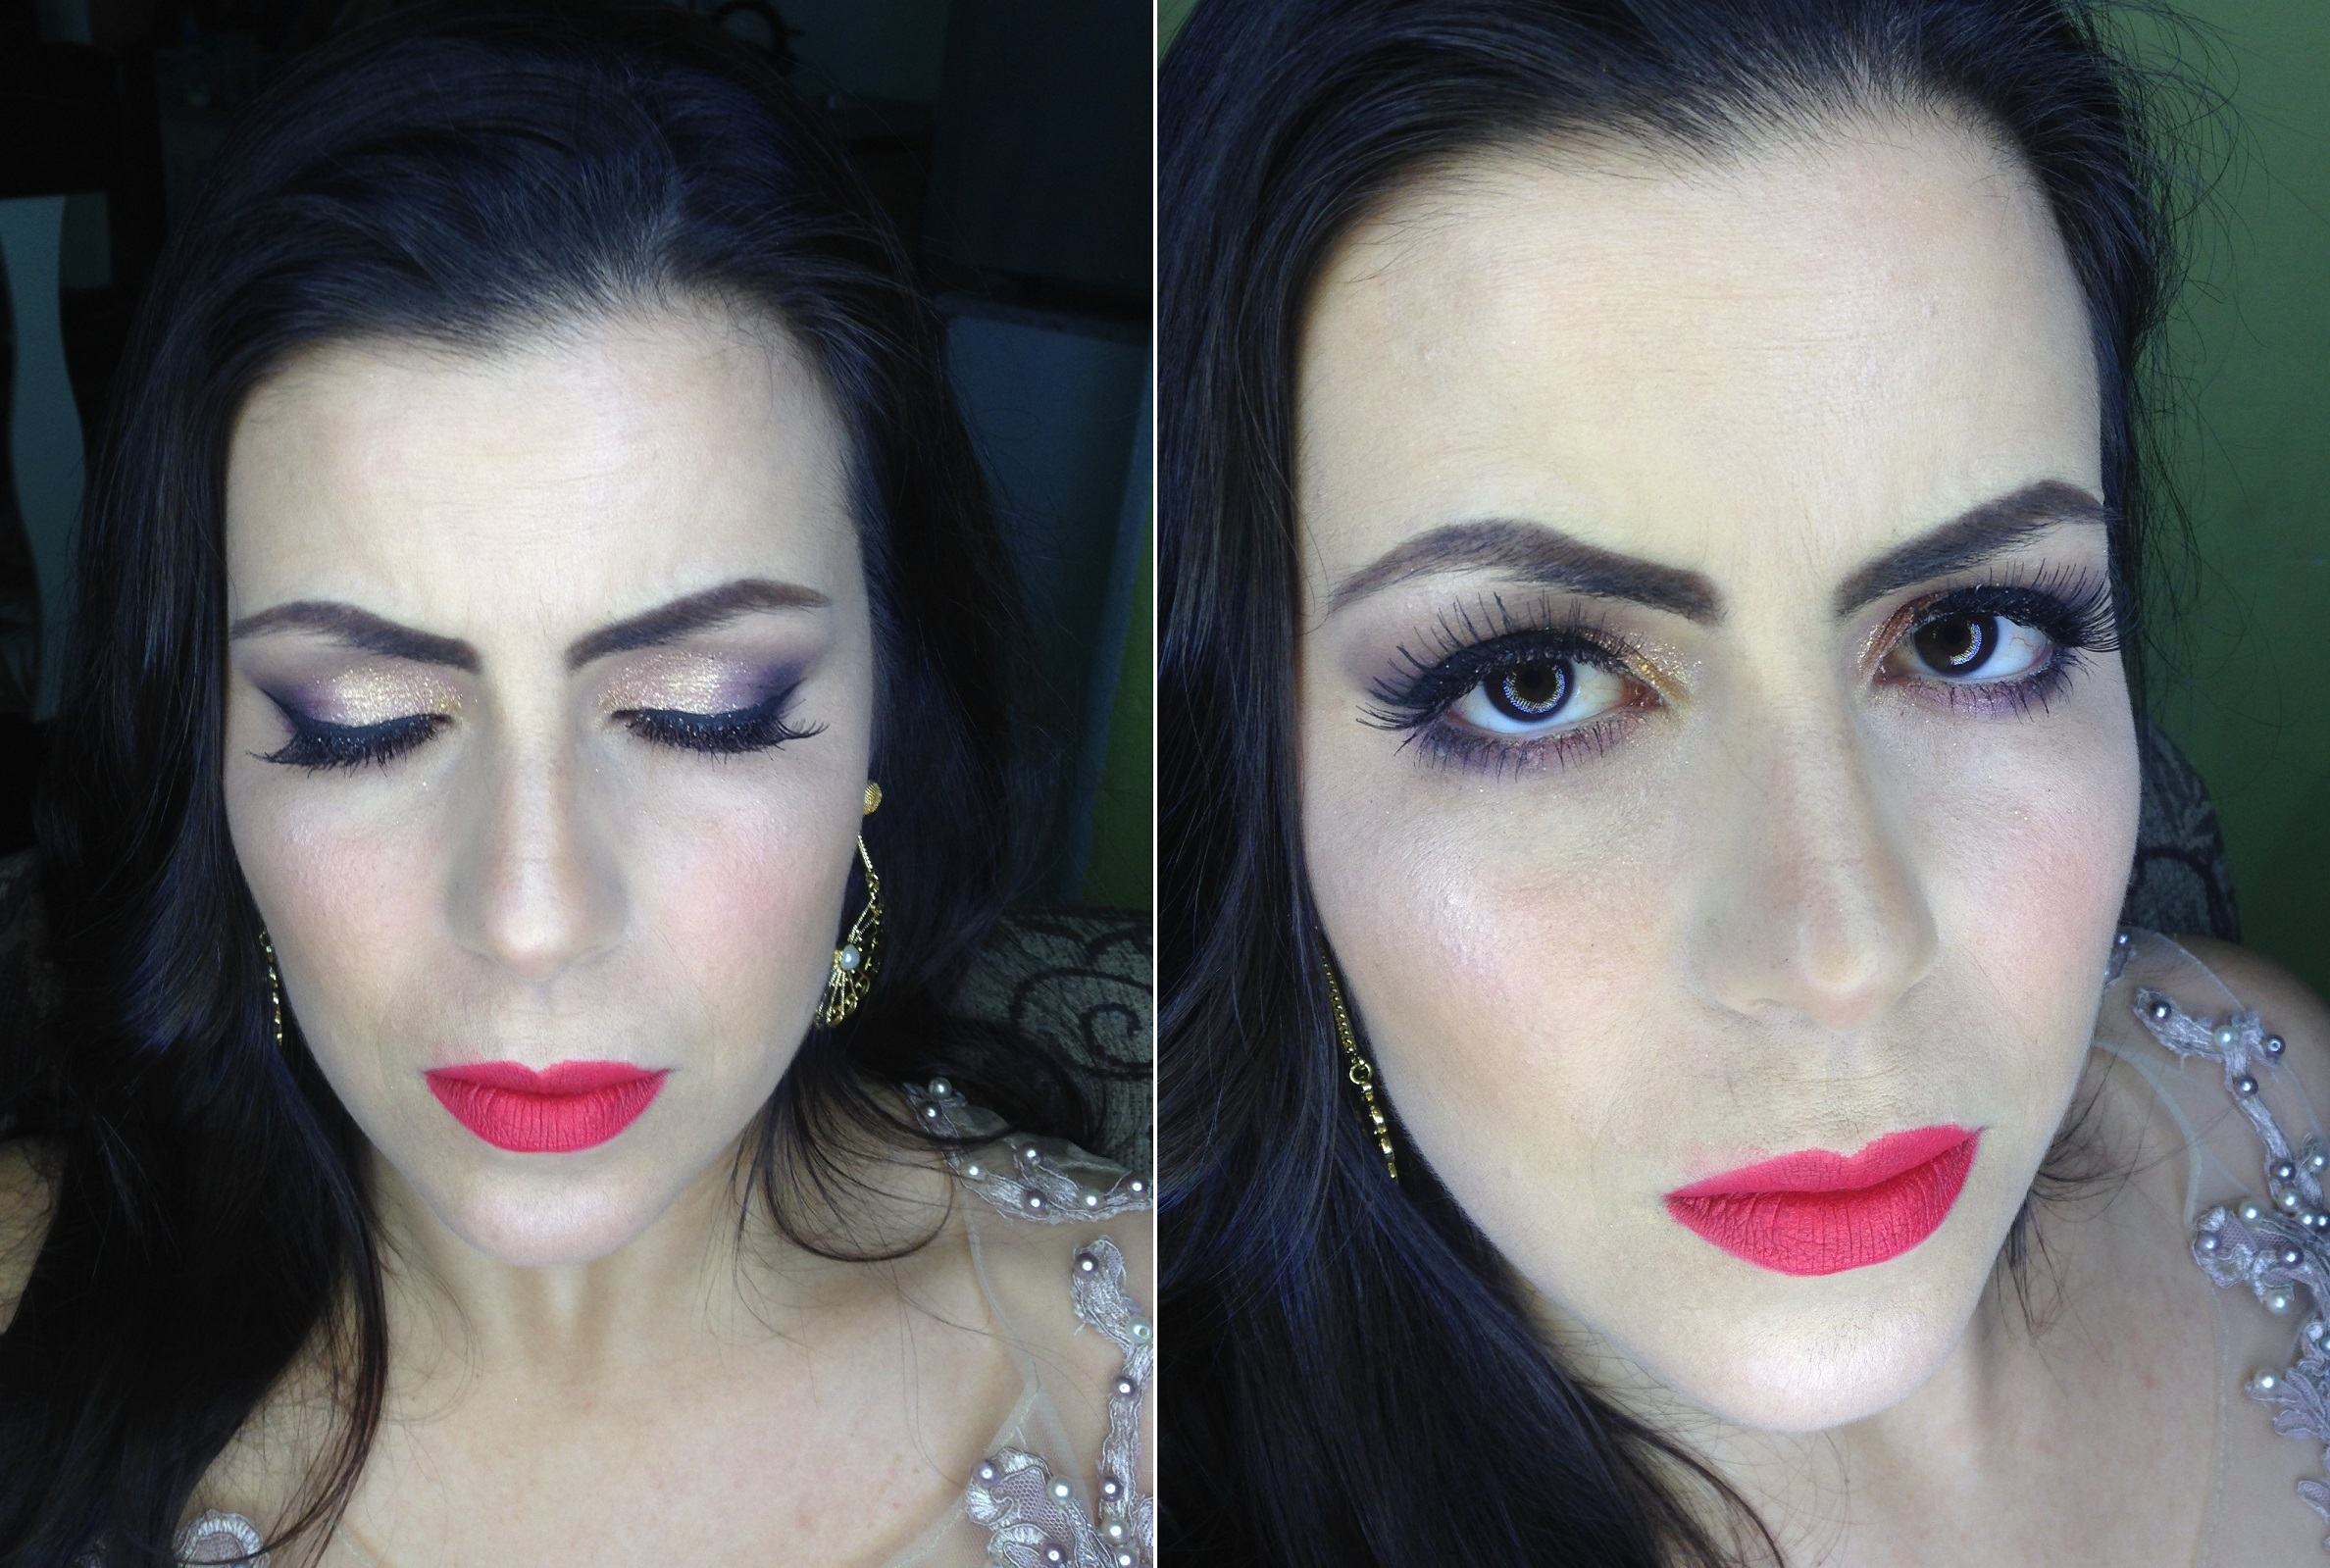 Maquiagem para madrinha de casamento - Instagram @geisamedeirosmakeup #MakeUp #InstaMake #Maquiagem #MaquiagemDeFesta #MaquiagemProfissional #MaquiagemSocial #MaquiagemNoiva #GeisaMedeirosMakeUp #PPF #PausaParaFeminices #Vult #VultCosmética #Bitarra #MaryKay #RubyRose #Luisance #Dailus #QuemDisseBerenice #Contém1g #Morphe #PincéisMacrilan #LuFerraes #Mac maquiagem maquiador(a) designer de sobrancelhas